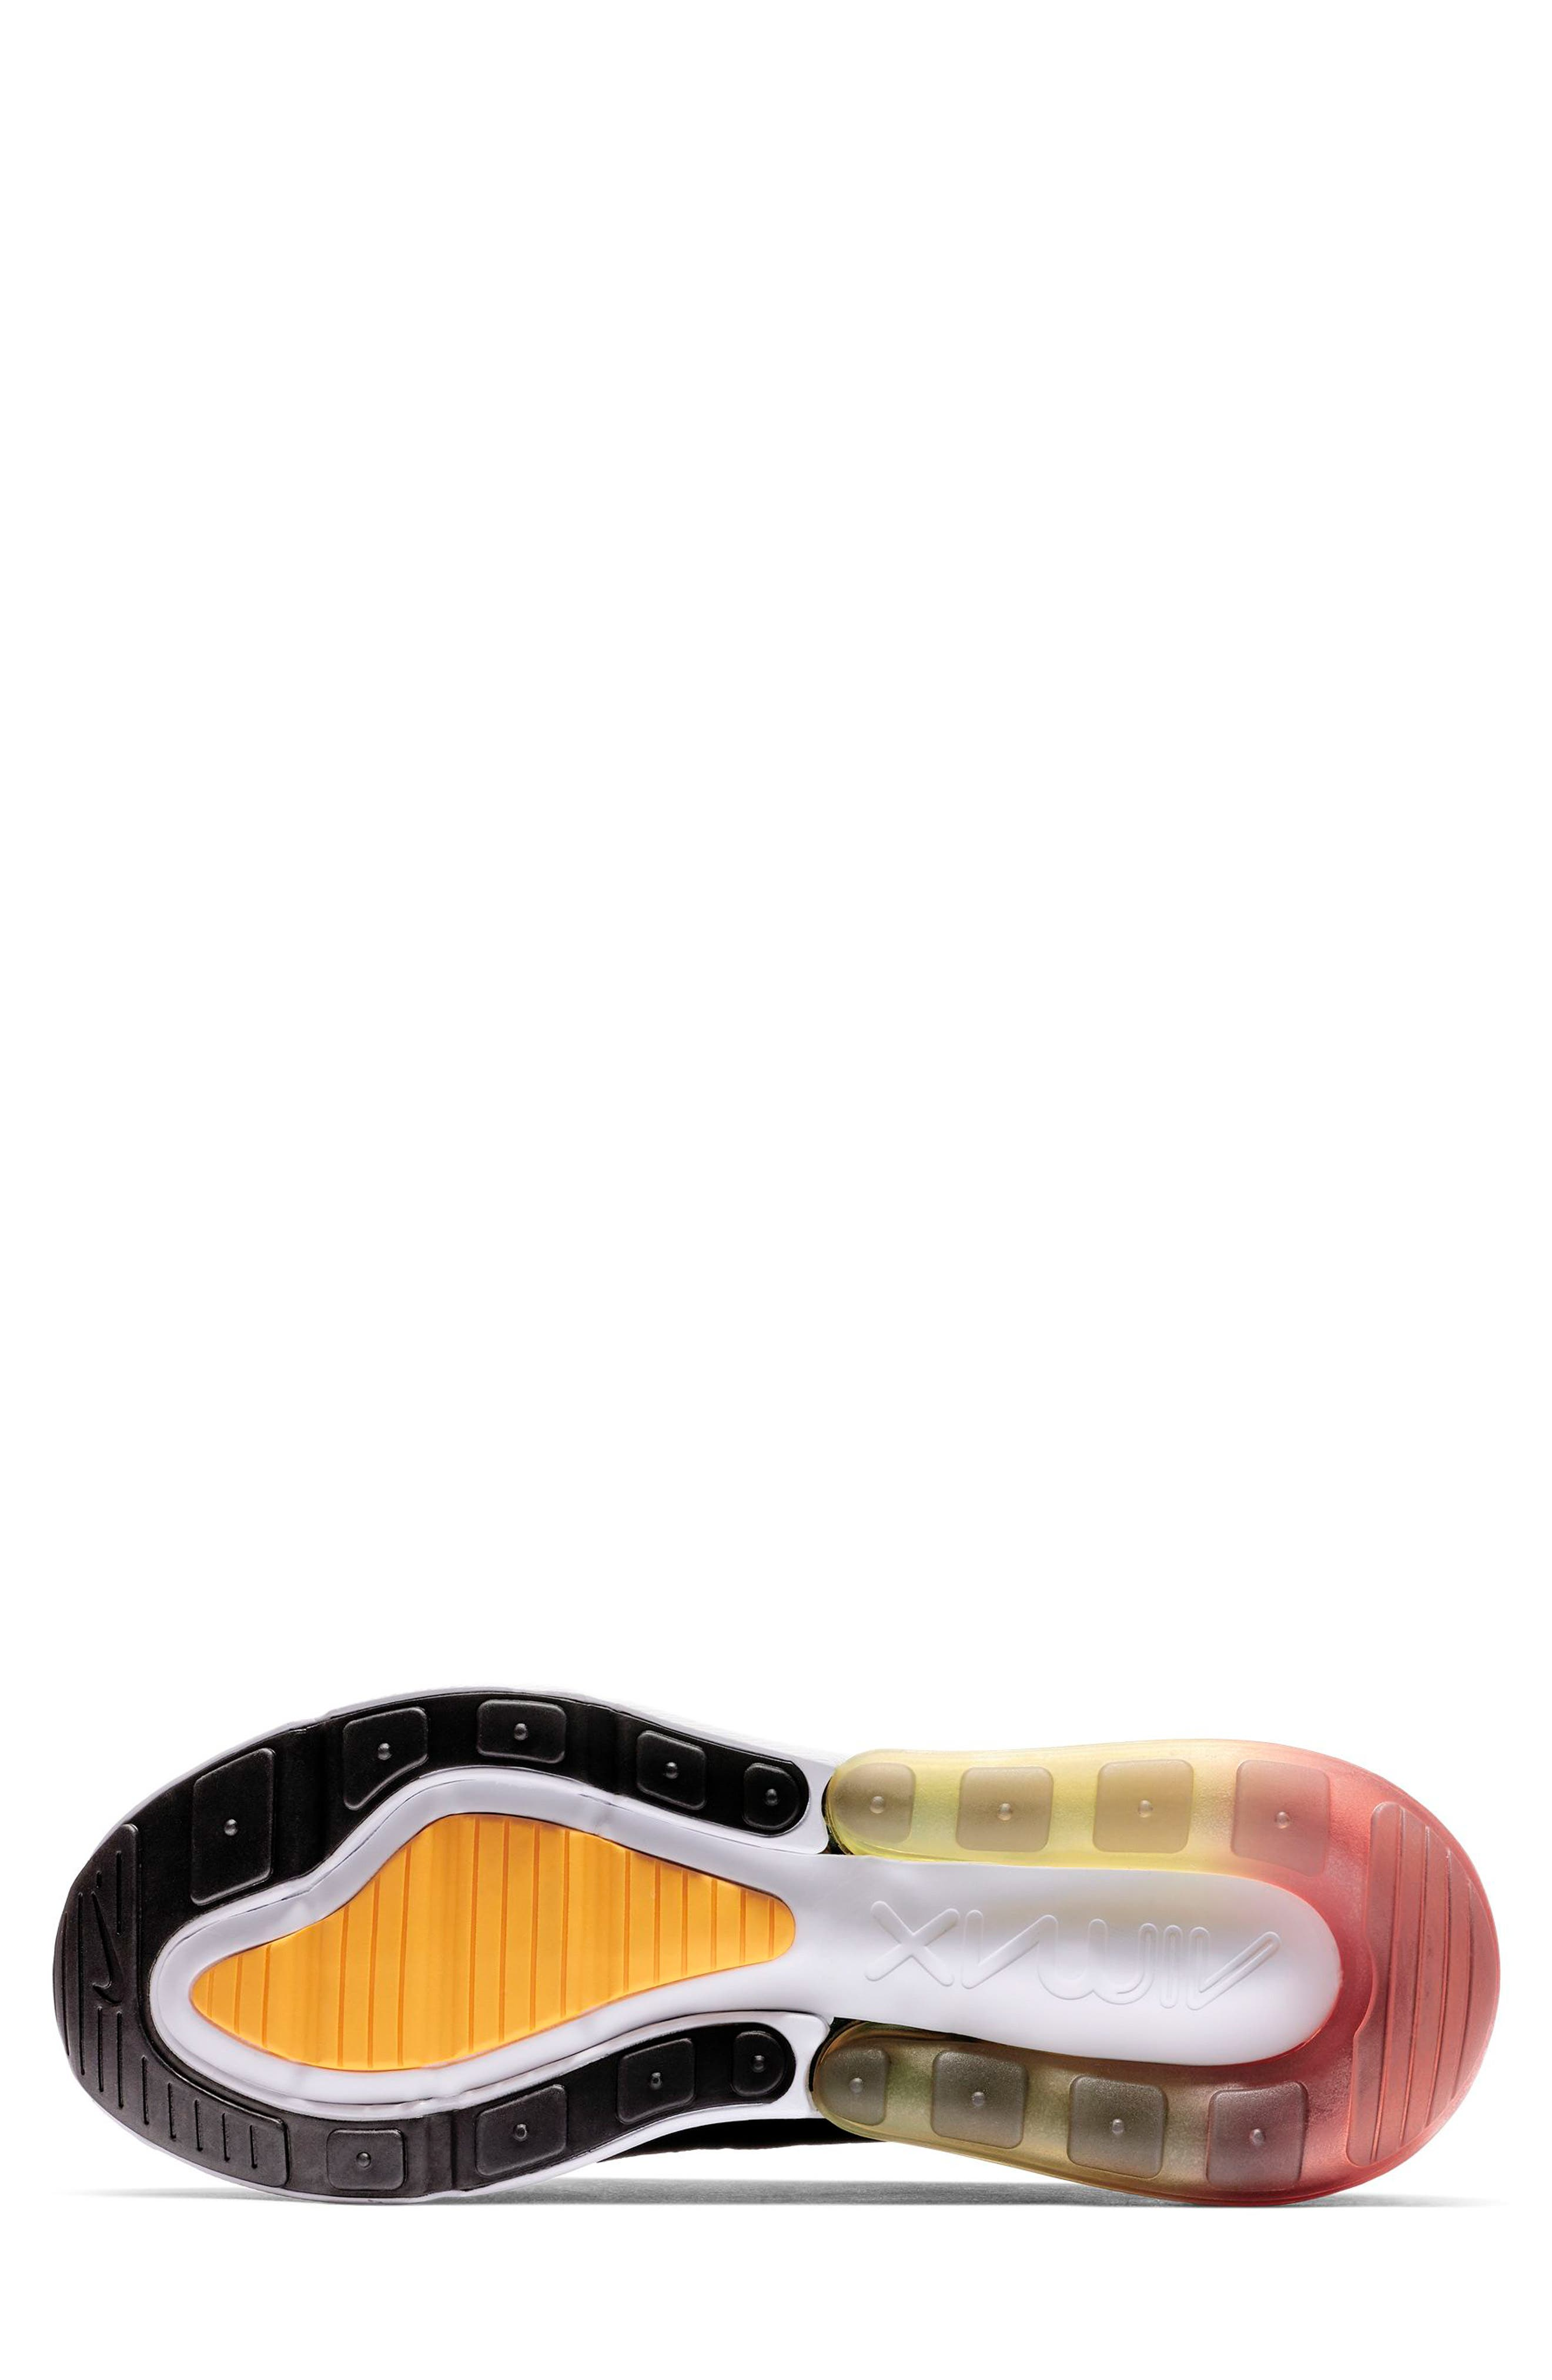 NIKE,                             Air Max 270 SE Sneaker,                             Alternate thumbnail 5, color,                             BLACK/ ORANGE/ EMBER GLOW